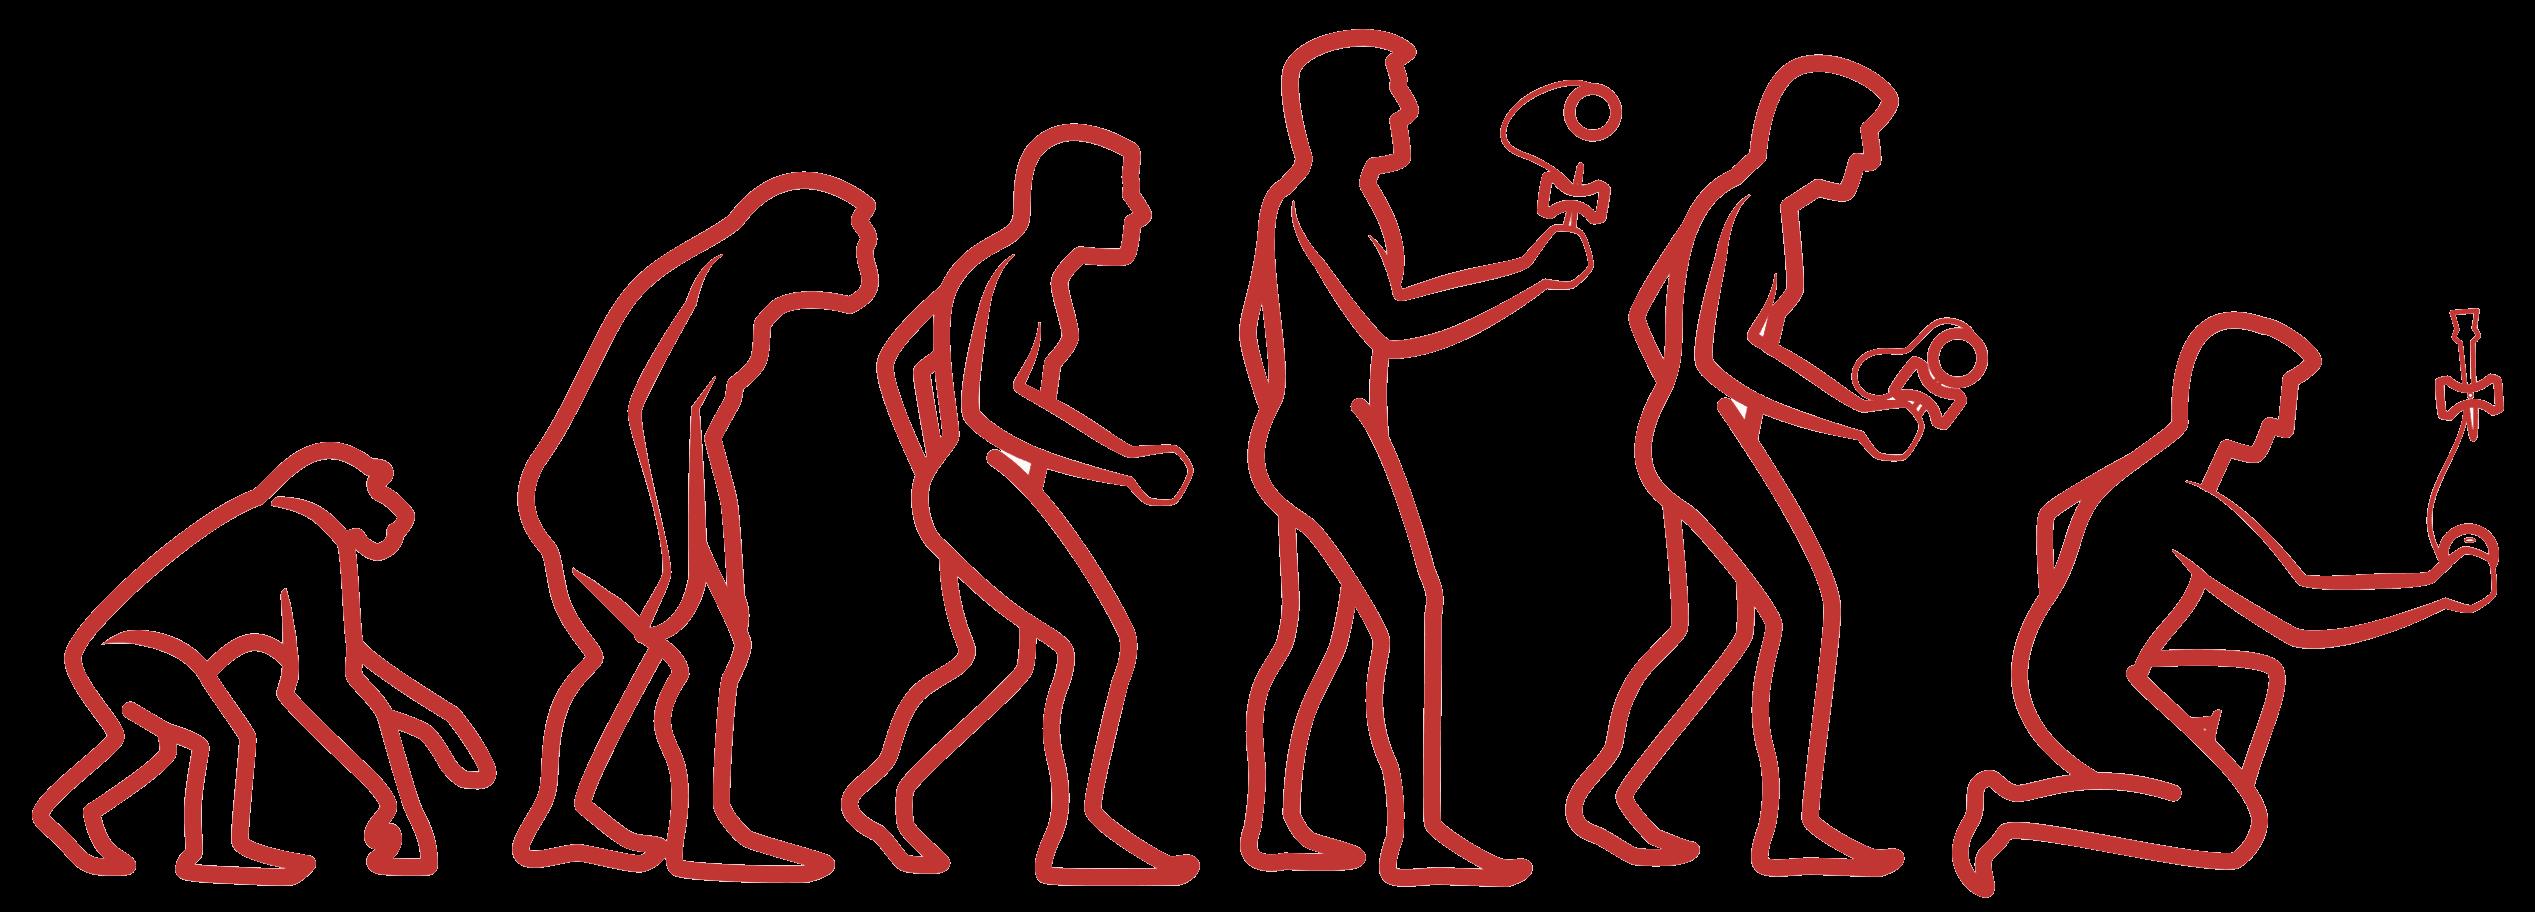 evolution-banner-2